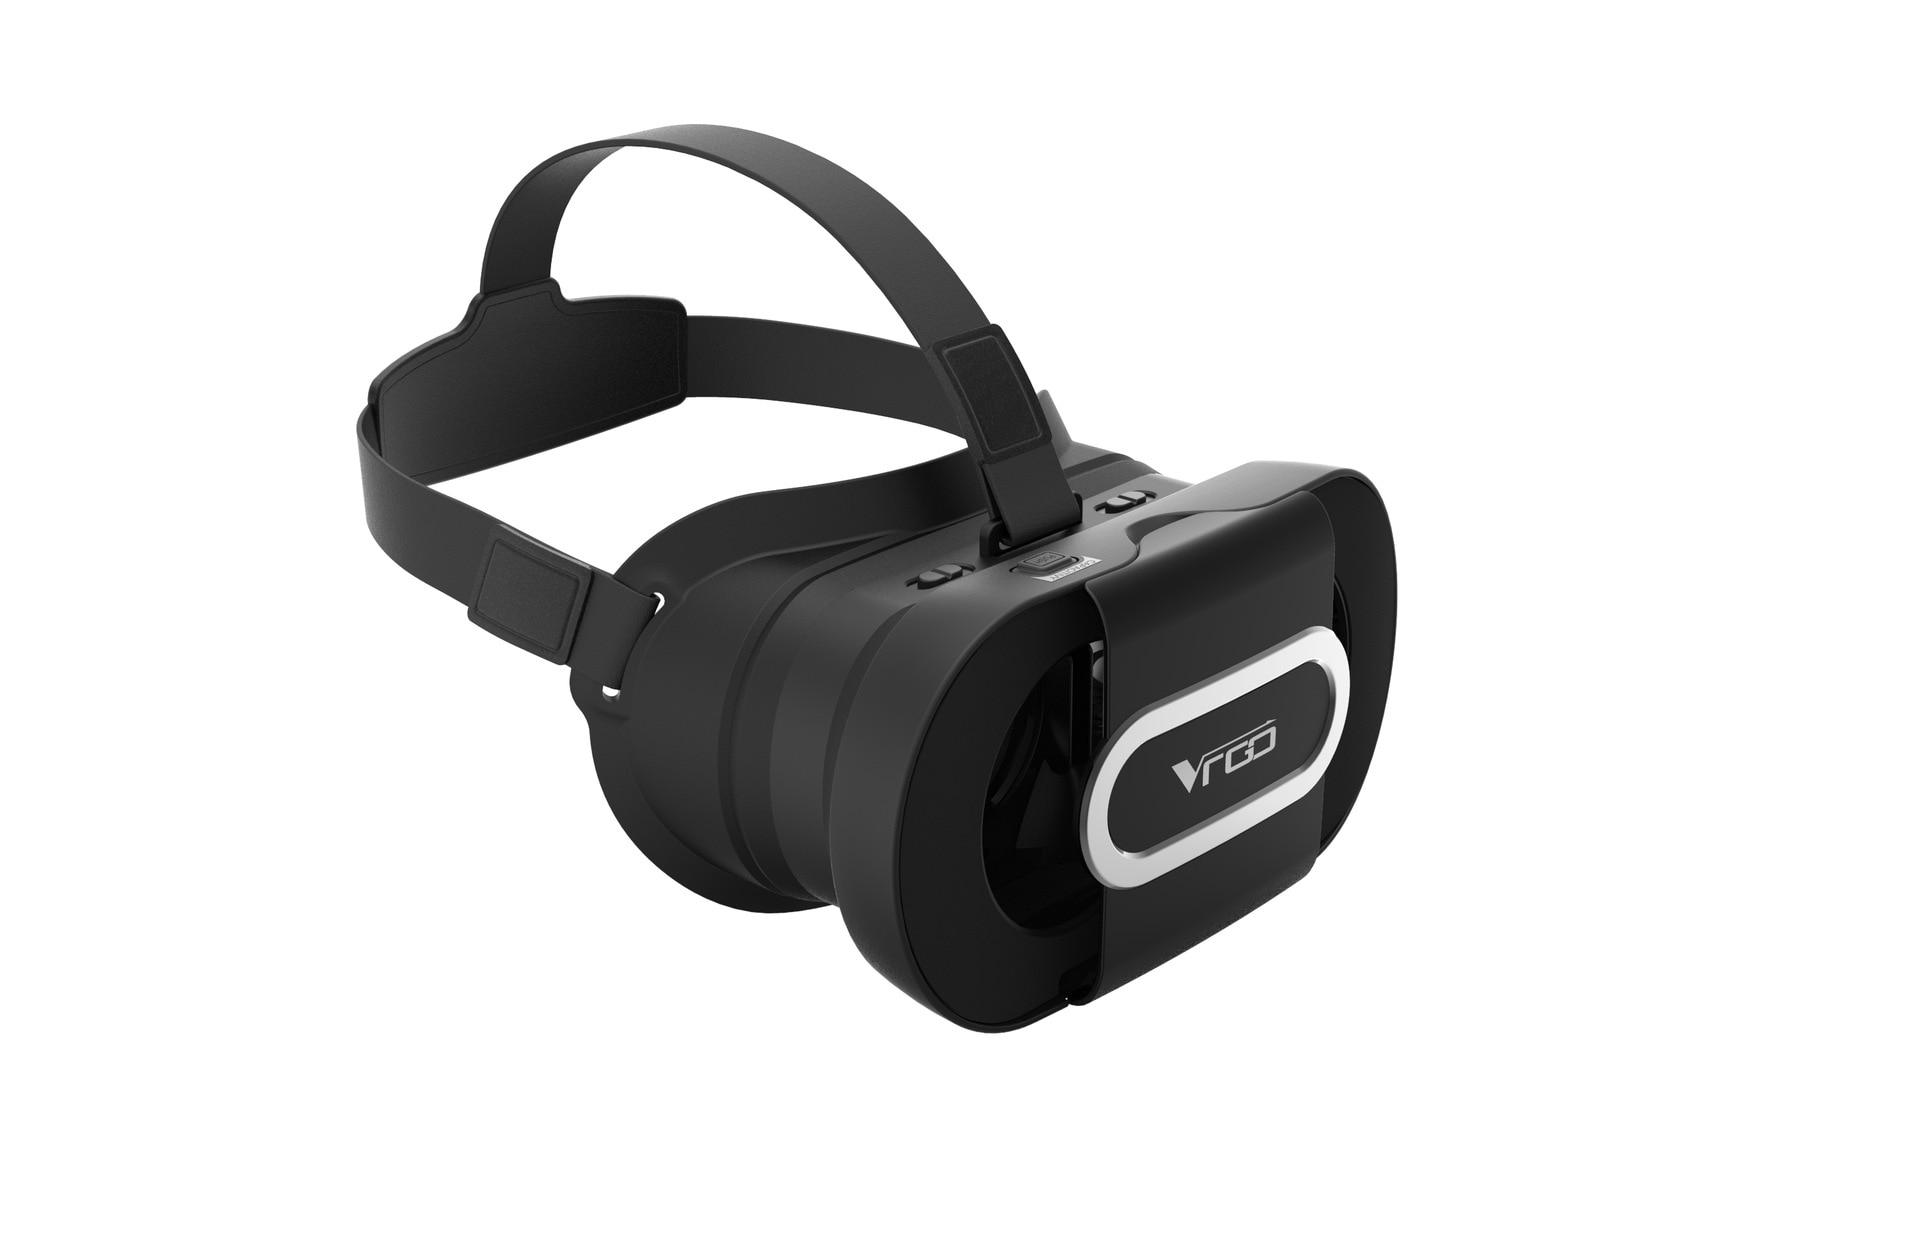 RITECH VR GO Portable Foldabe 3 D Video VR Glasses Box Virtual Reality Movie Helmet Box for 4.7-6 inch Smartphone F19941/2